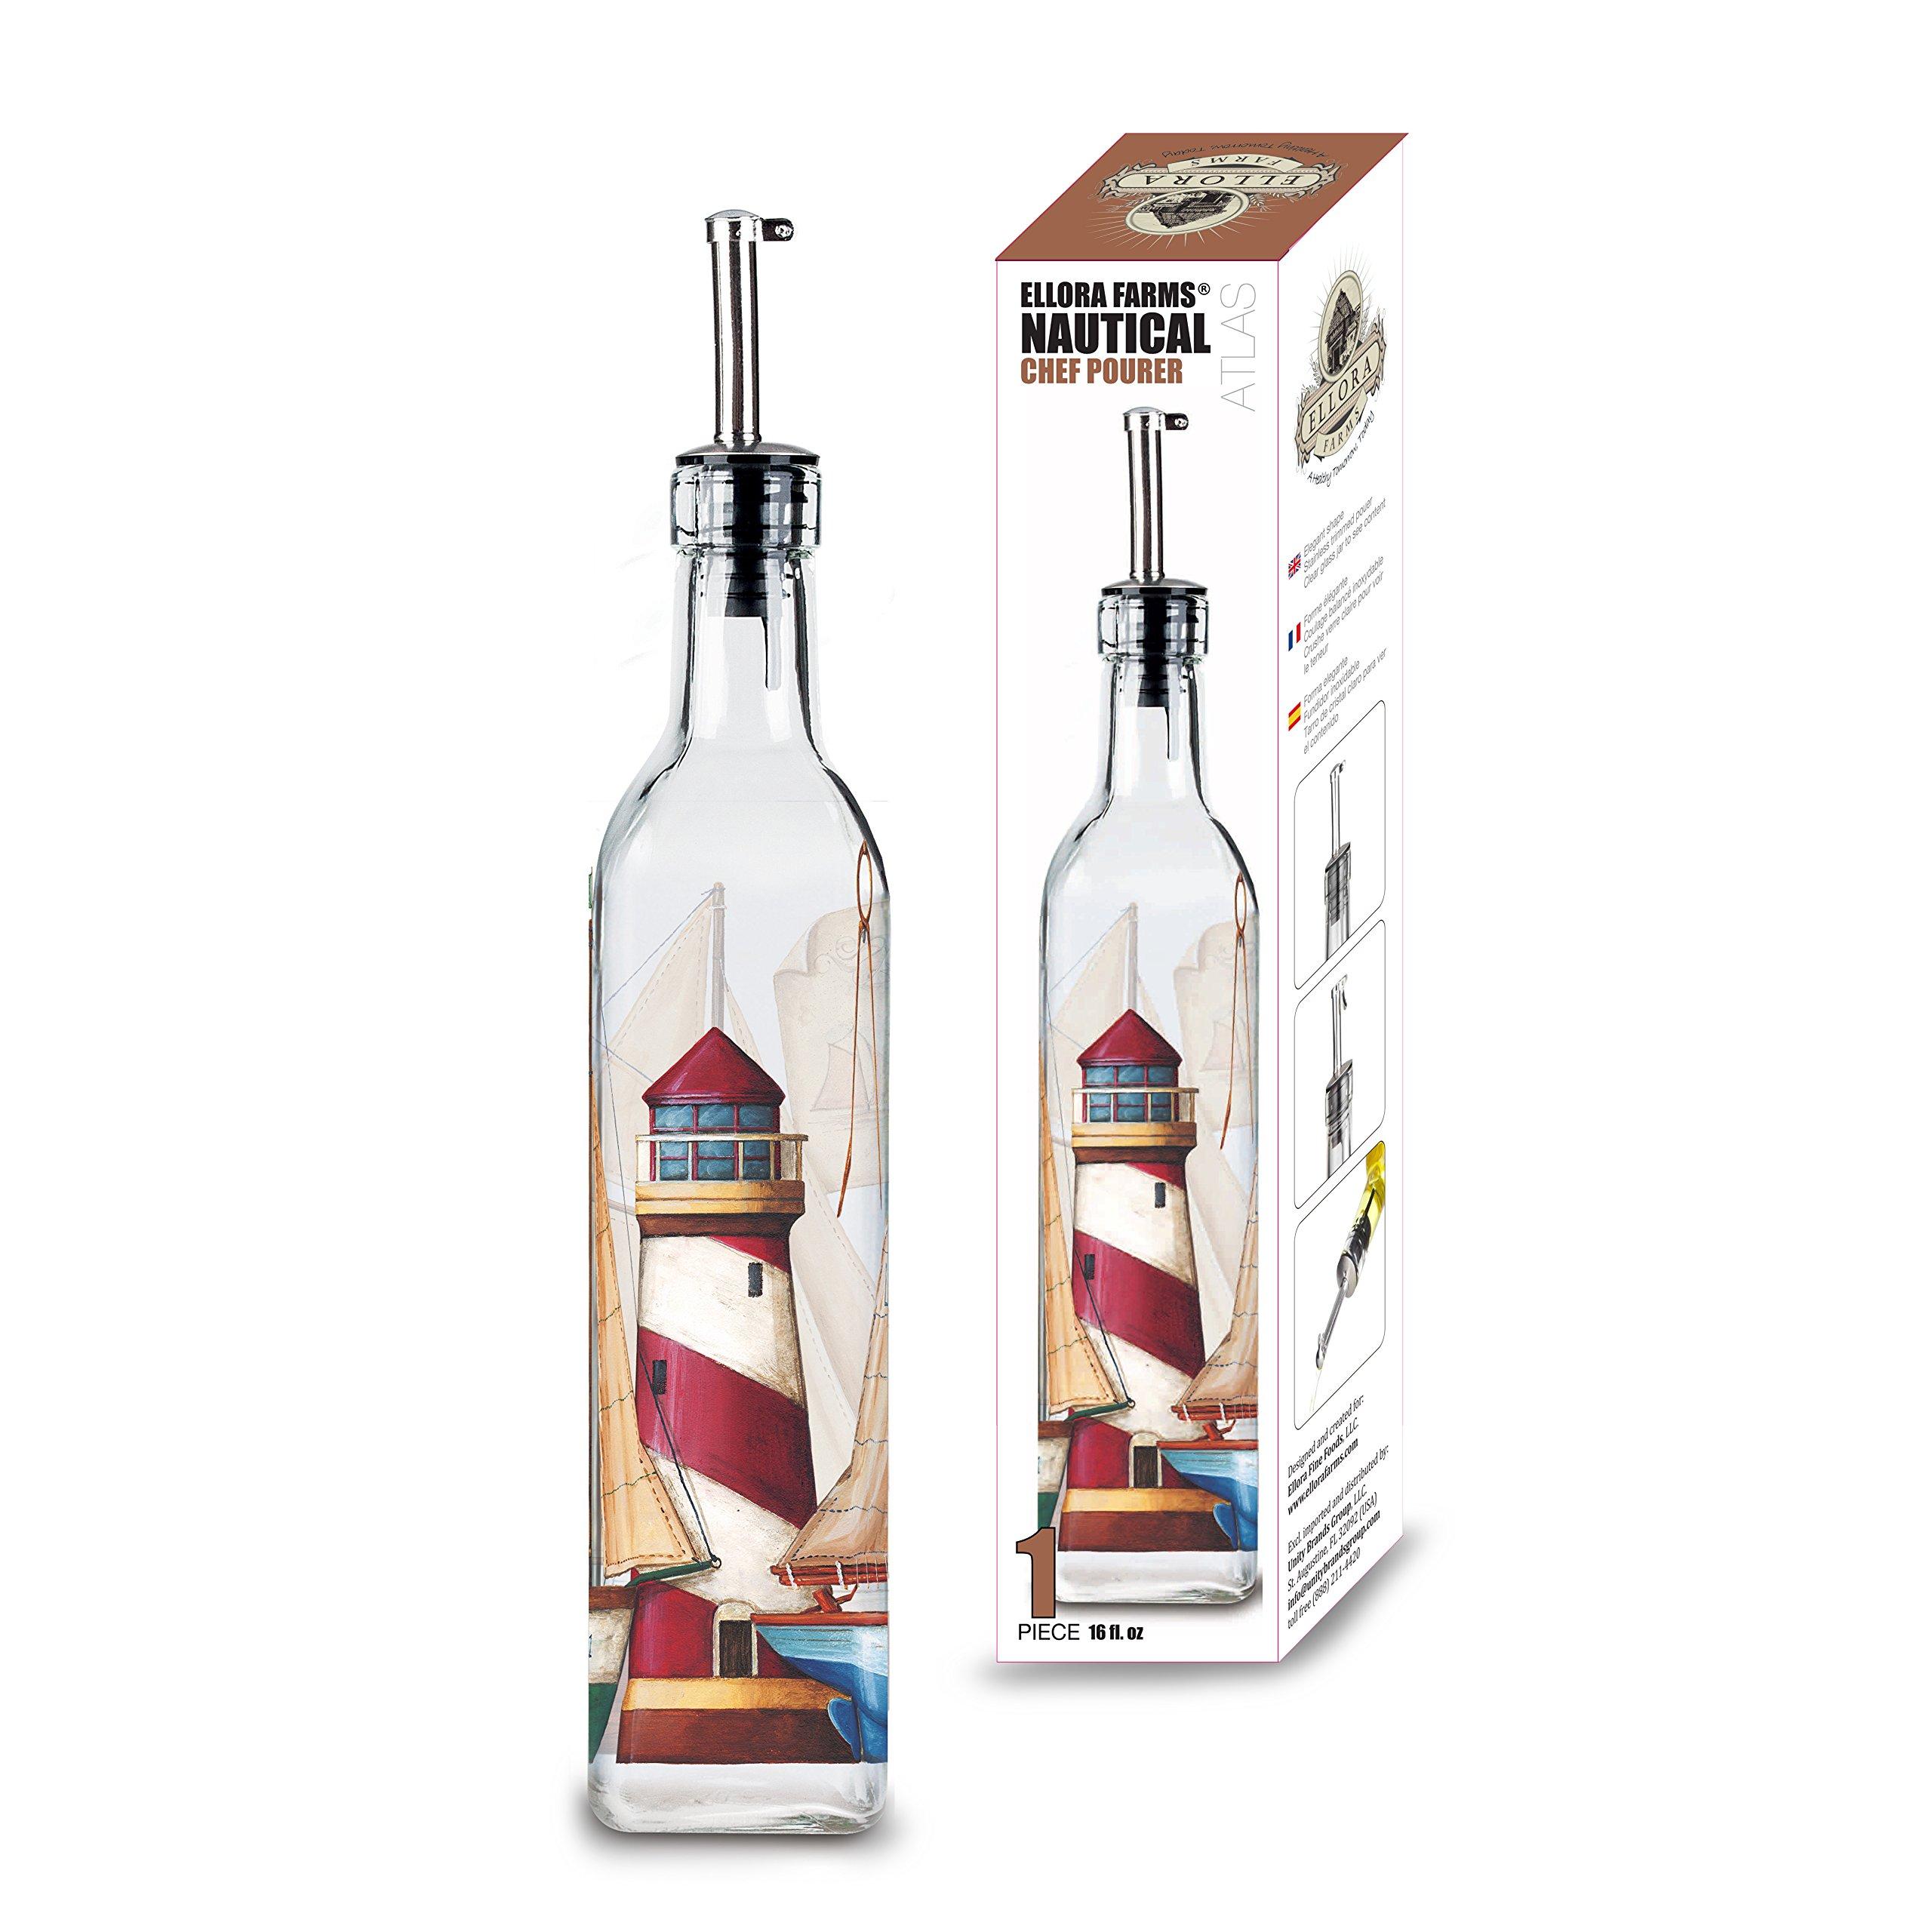 Ellora Farms | Atlas Chef Pourer | Oil & Vinegar large glass dispenser | Lighthouse Painted | Suitable for Olive Oil, Vinegar, Balsamic, Salad dressing, Wine | Large 17 Oz. Glass Bottle